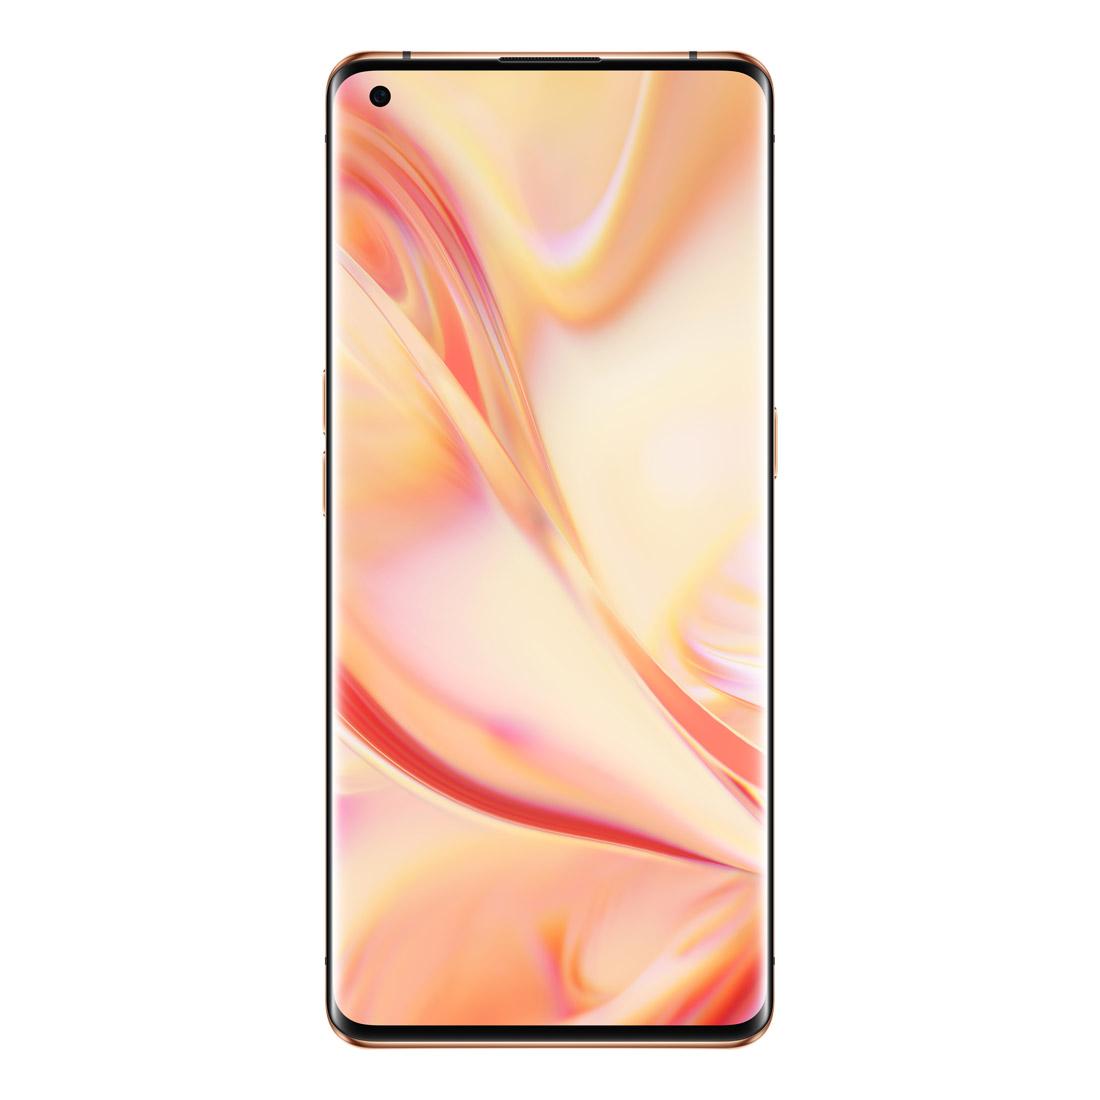 OPPO Find X2 Pro 5G (Pre Order ETA 10/6, 512GB/12GB) - Orange